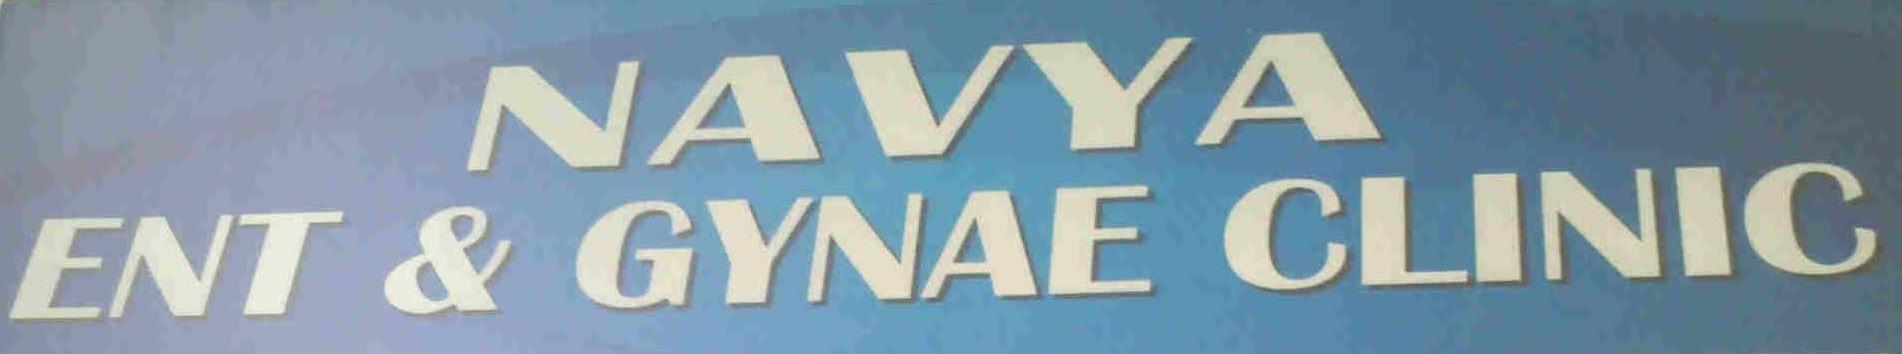 Navya ENT & Gynae Clinic, Delhi